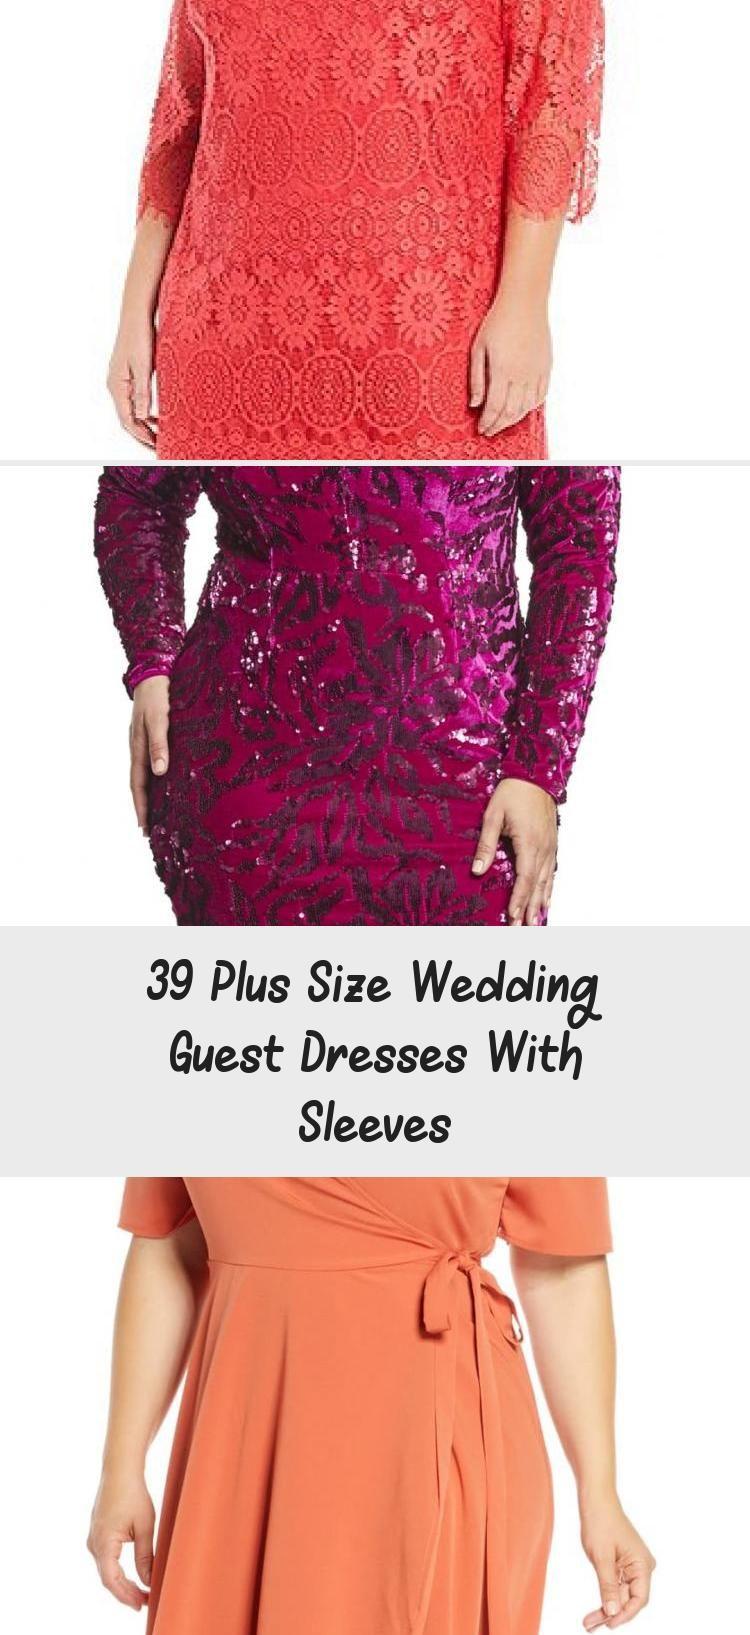 39 Plus Size Wedding Guest Dresses With Sleeves Alexa Webb Afternoonweddingdressesg Plus Size Wedding Guest Dresses Dresses With Sleeves Wedding Guest Dress [ 1635 x 750 Pixel ]